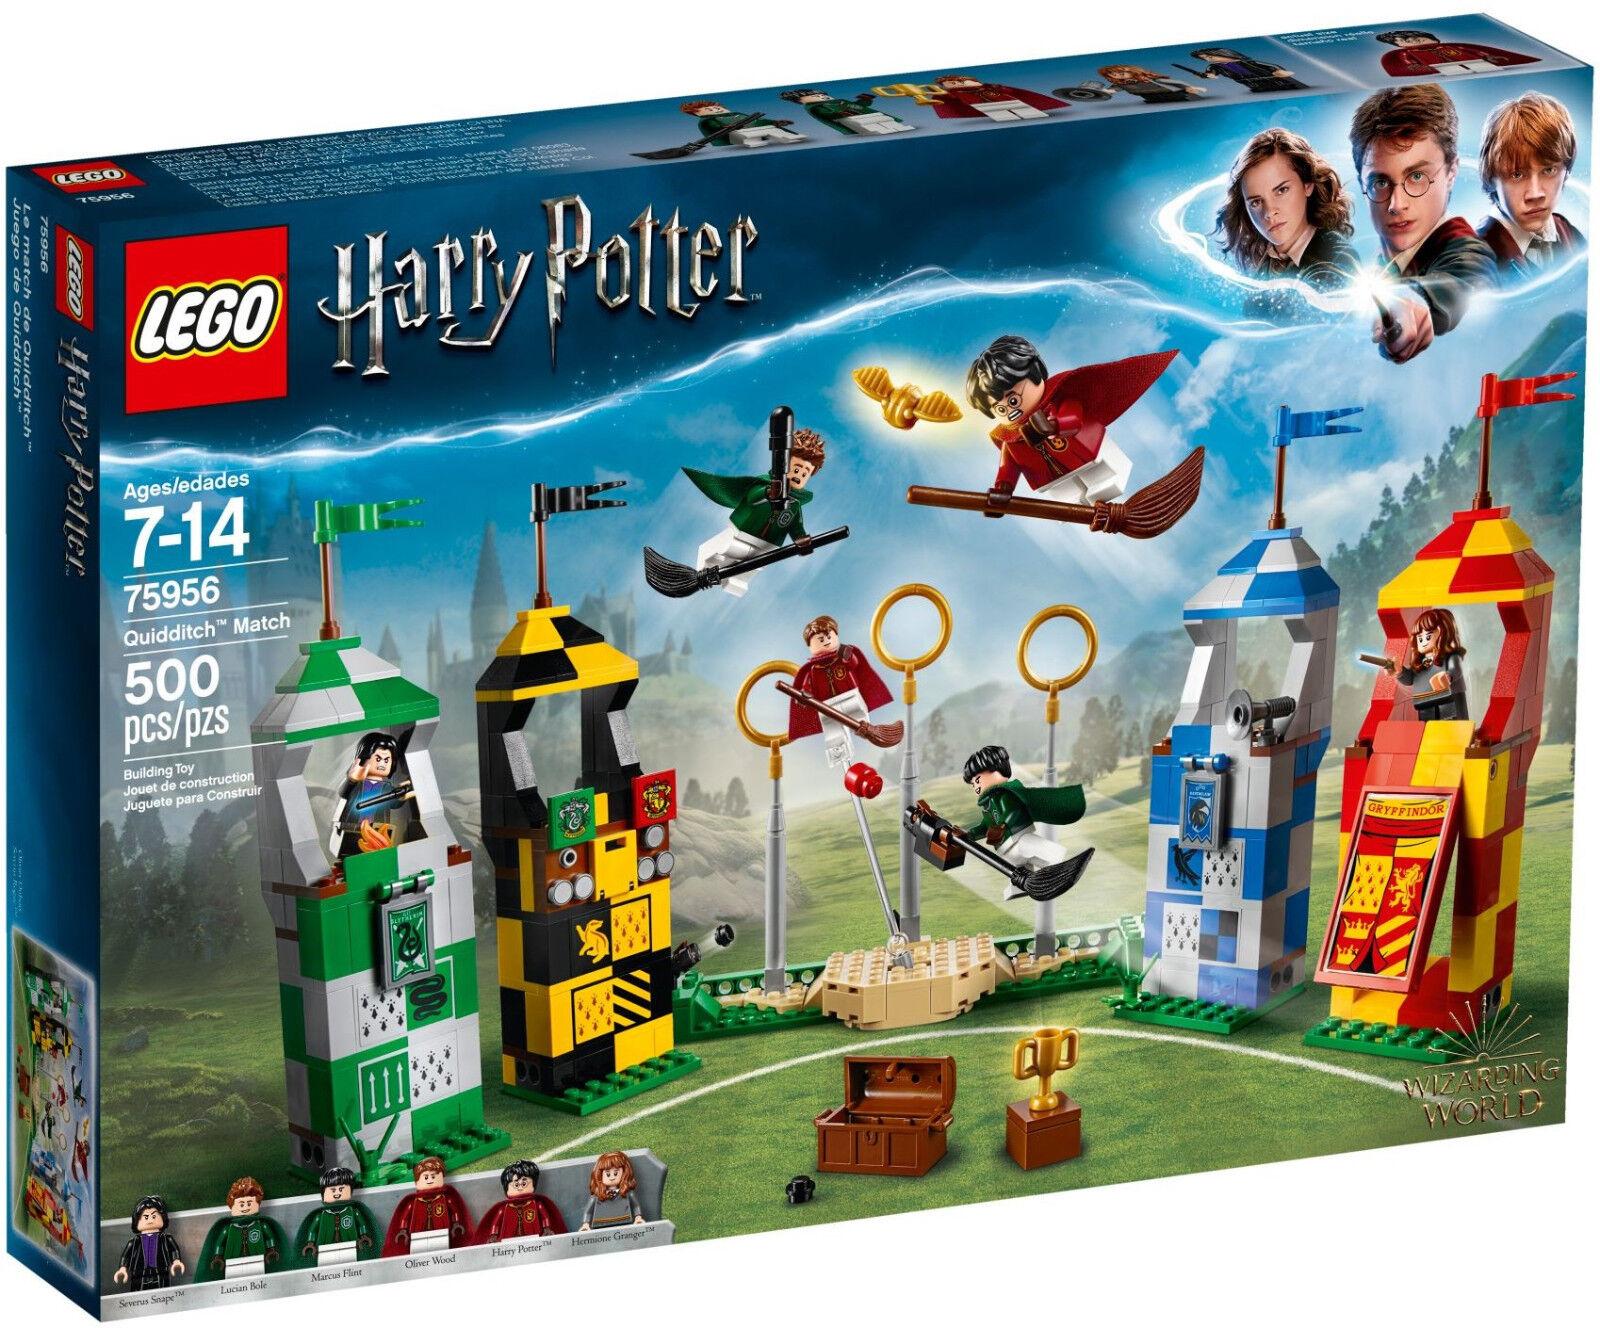 LEGO LEGO LEGO Harry Potter - 75956 Quidditch Turnier   Quidditch Match - Neu & OVP 0a64e5